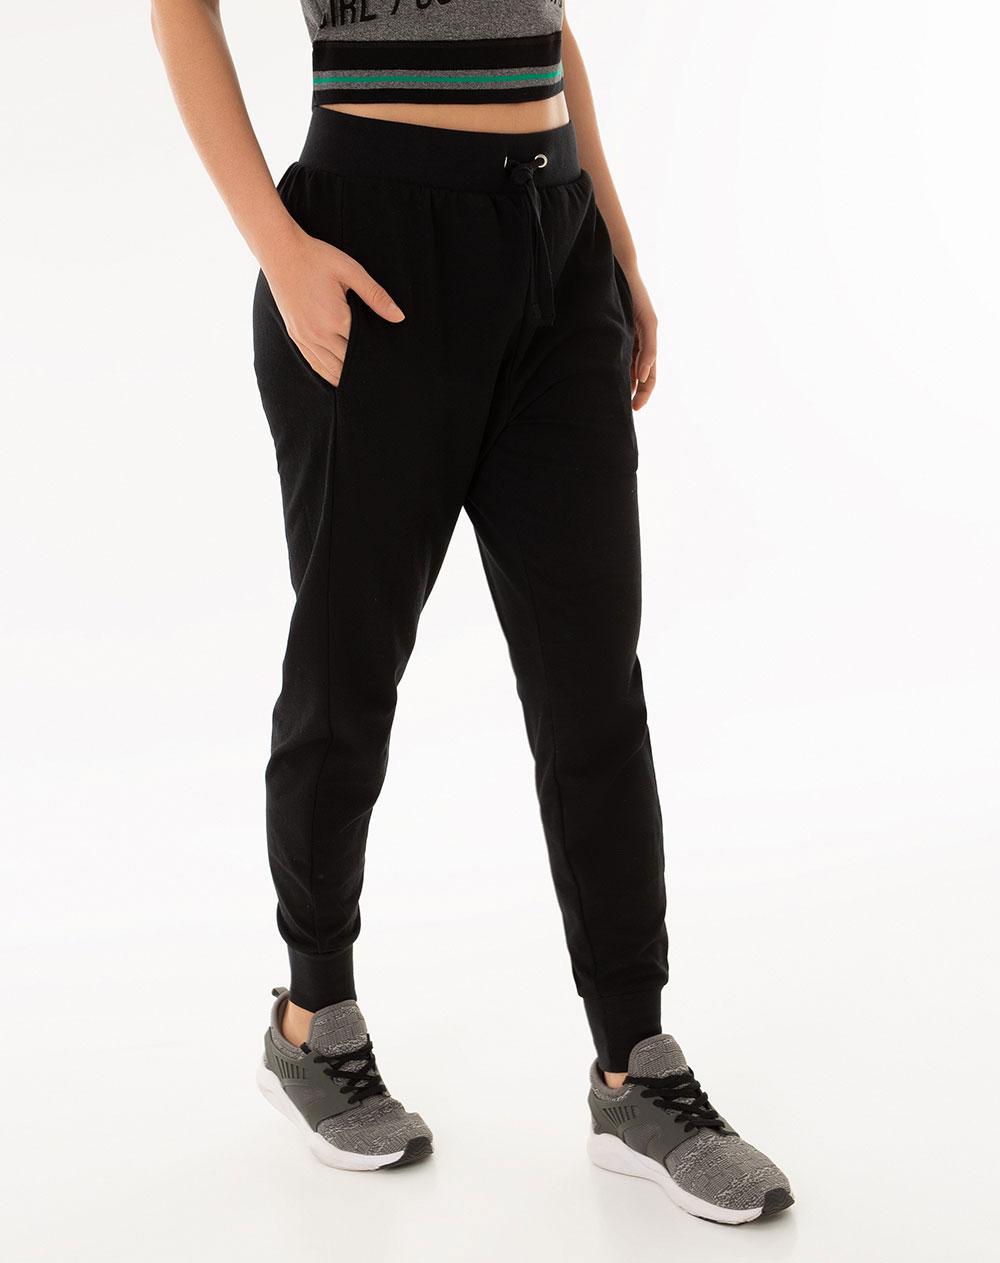 alta moda amplia selección estilo exquisito Pantalón para Mujer Quolli Pant Negro Gef